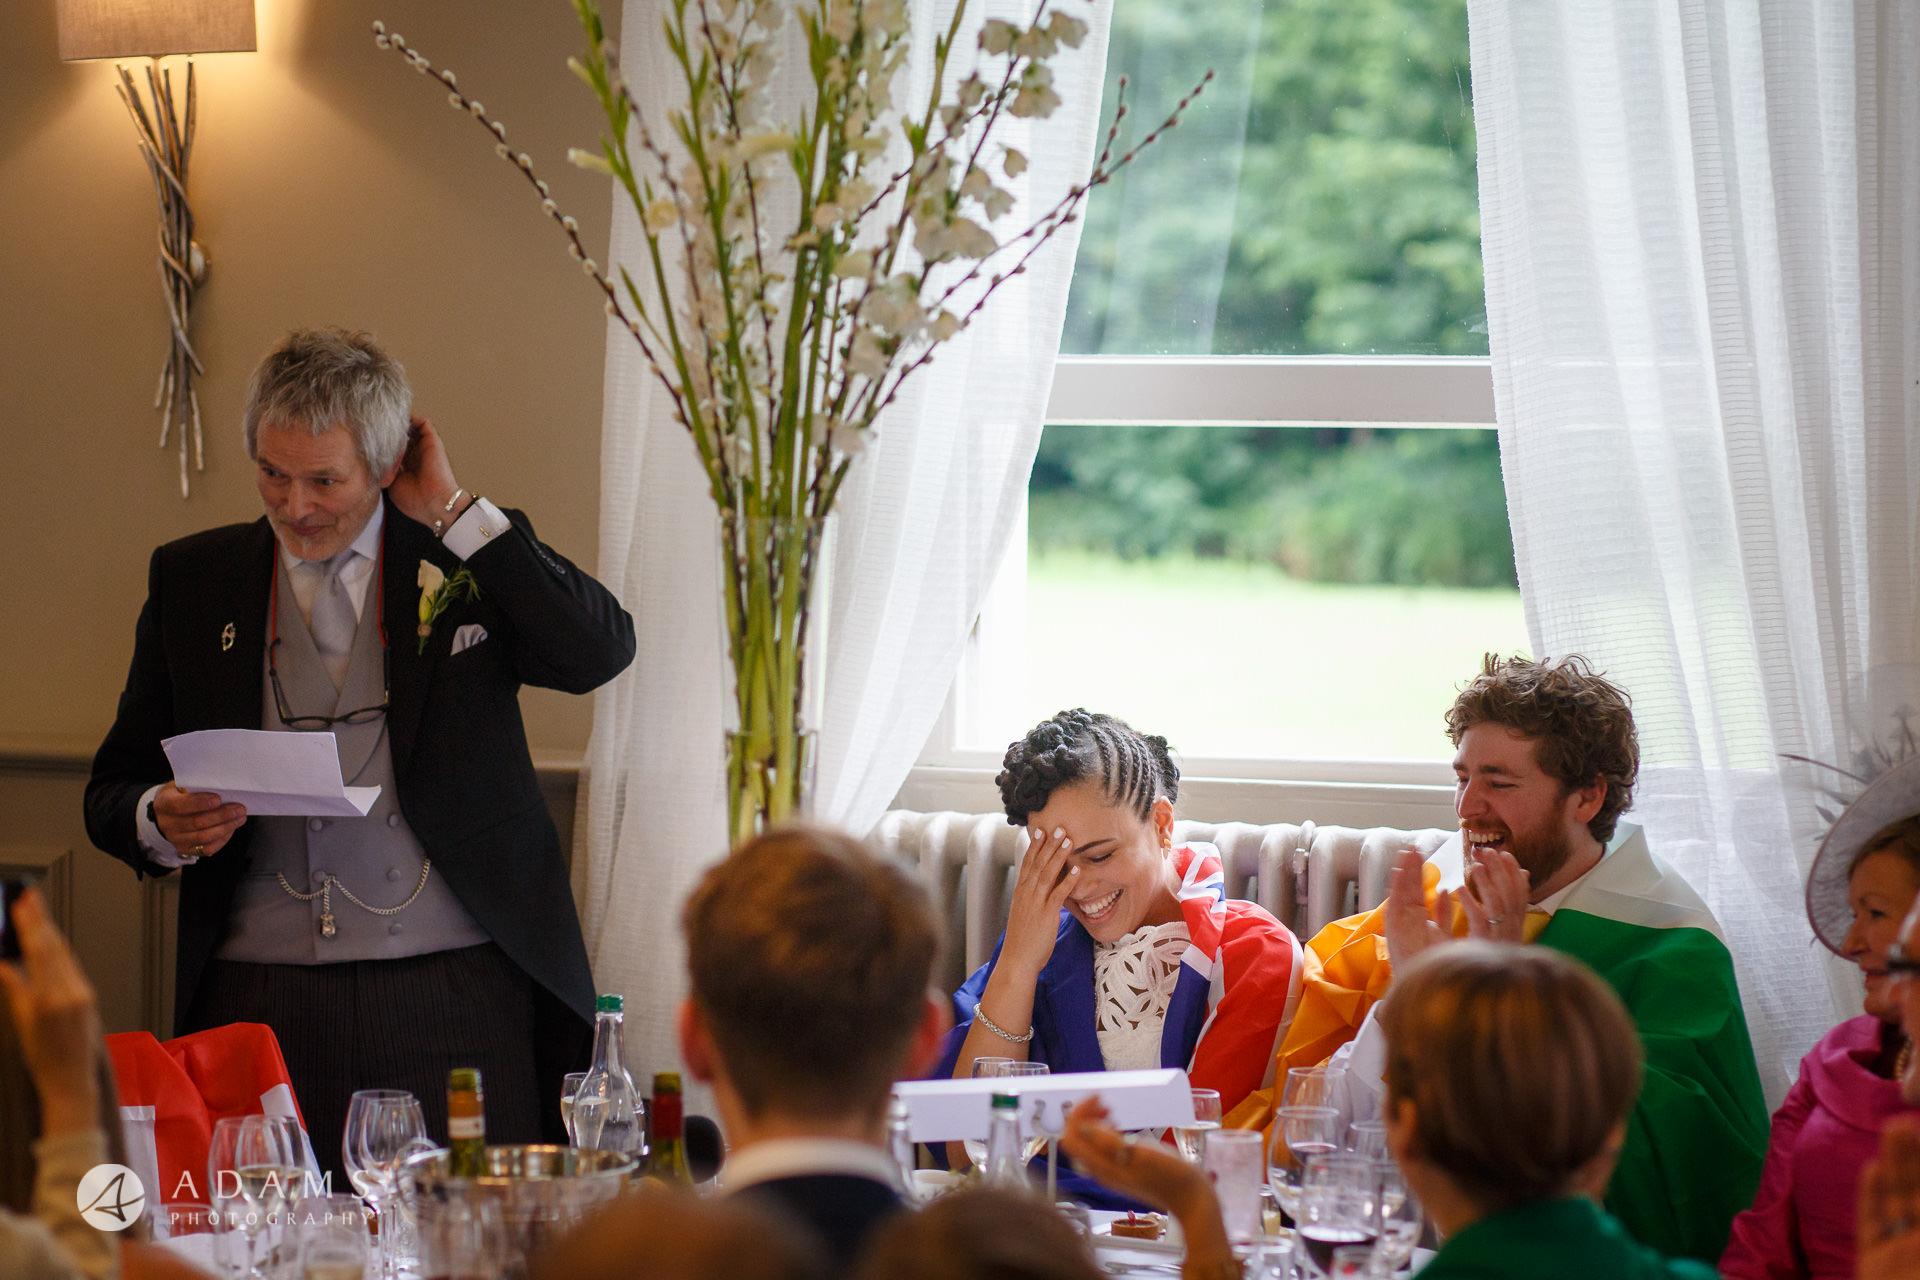 Morden Hall Wedding photographer father of the bride tells a joke reaction